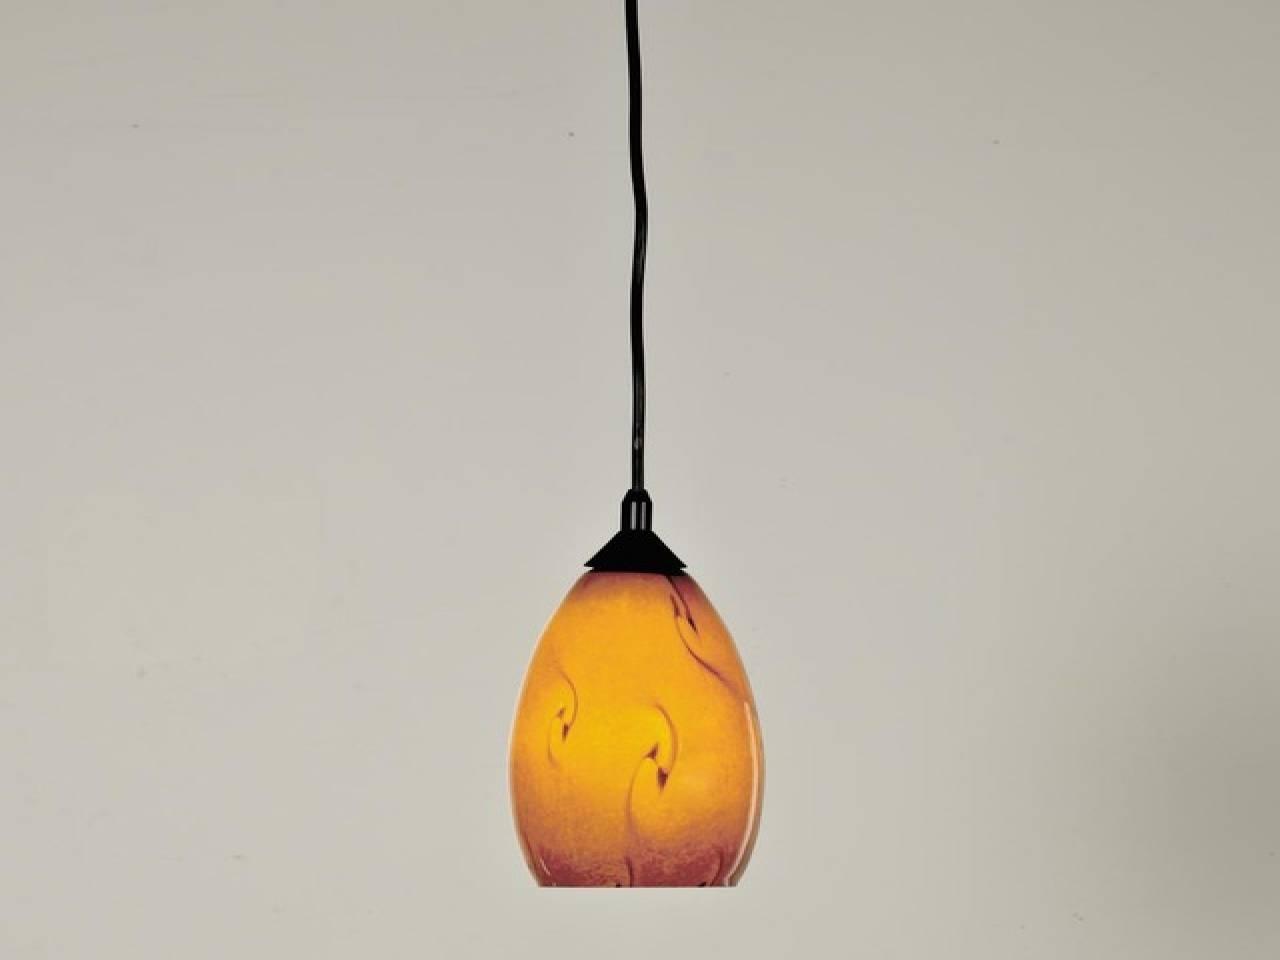 Astonishing Murano Glass Pendant Light 45 In Glass Pendant Lights within Murano Glass Ceiling Lights (Image 2 of 15)